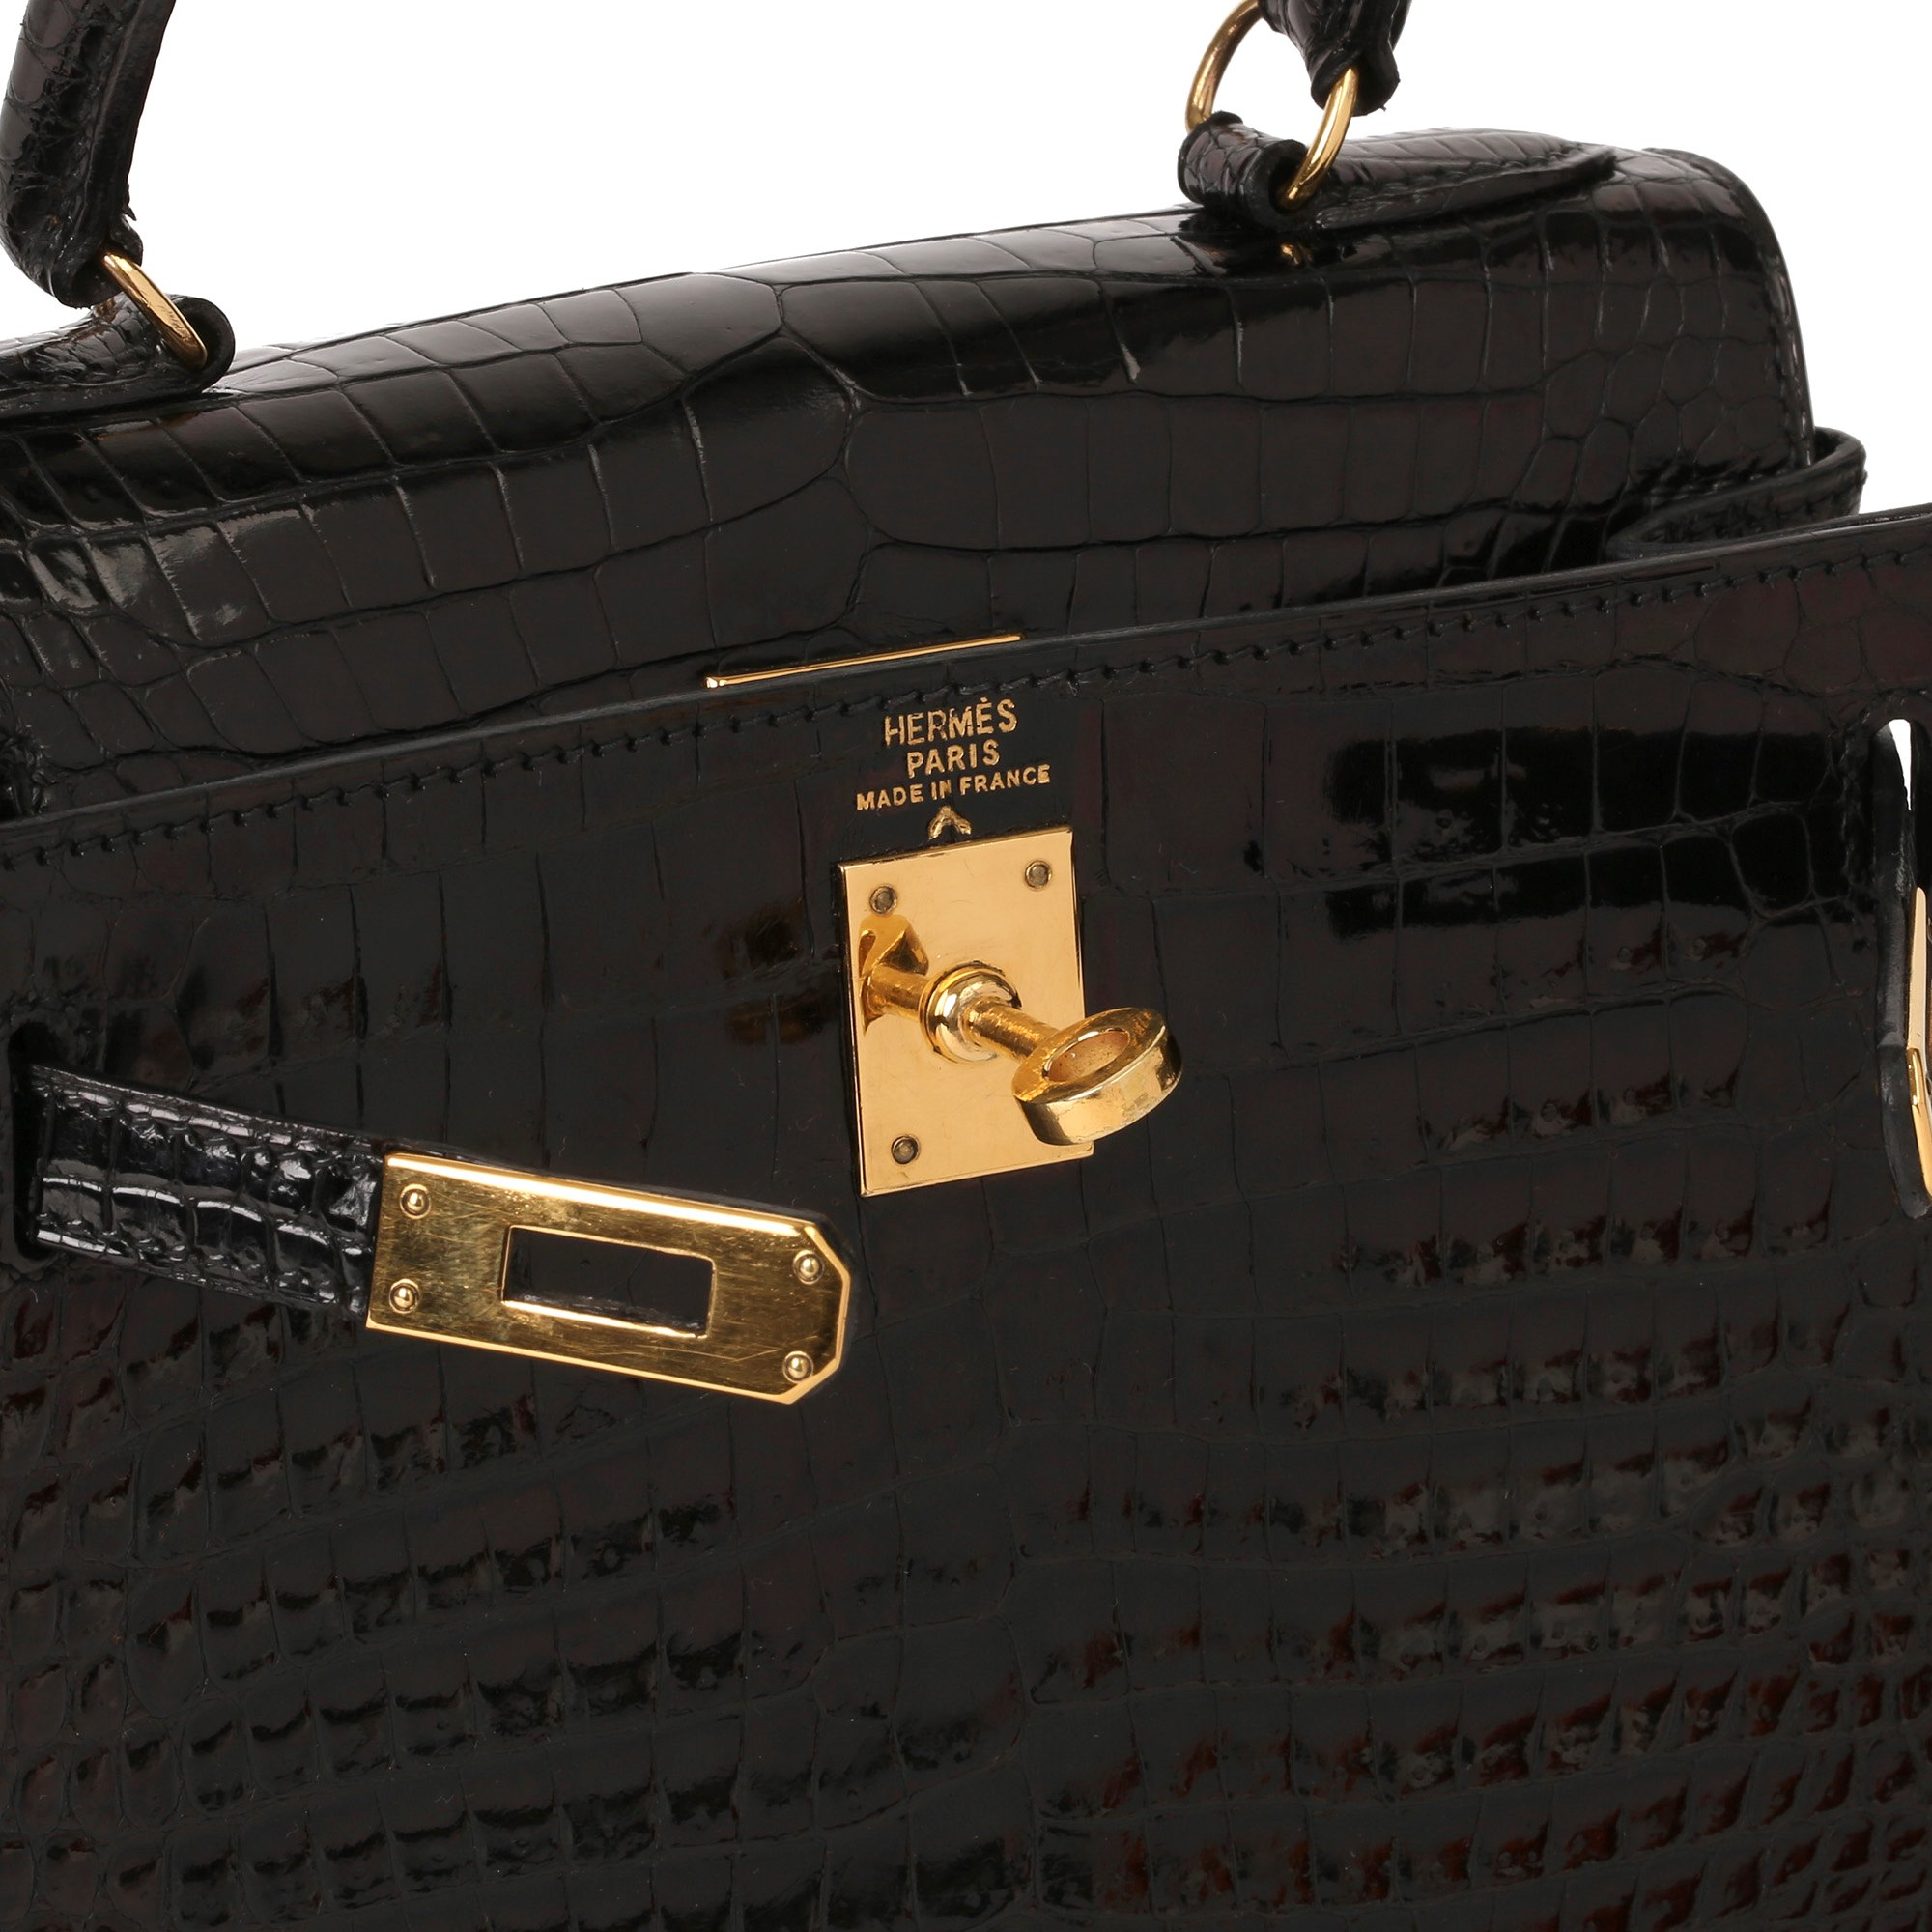 Hermès Black Shiny Porosus Crocodile Leather Vintage Kelly 20cm Sellier